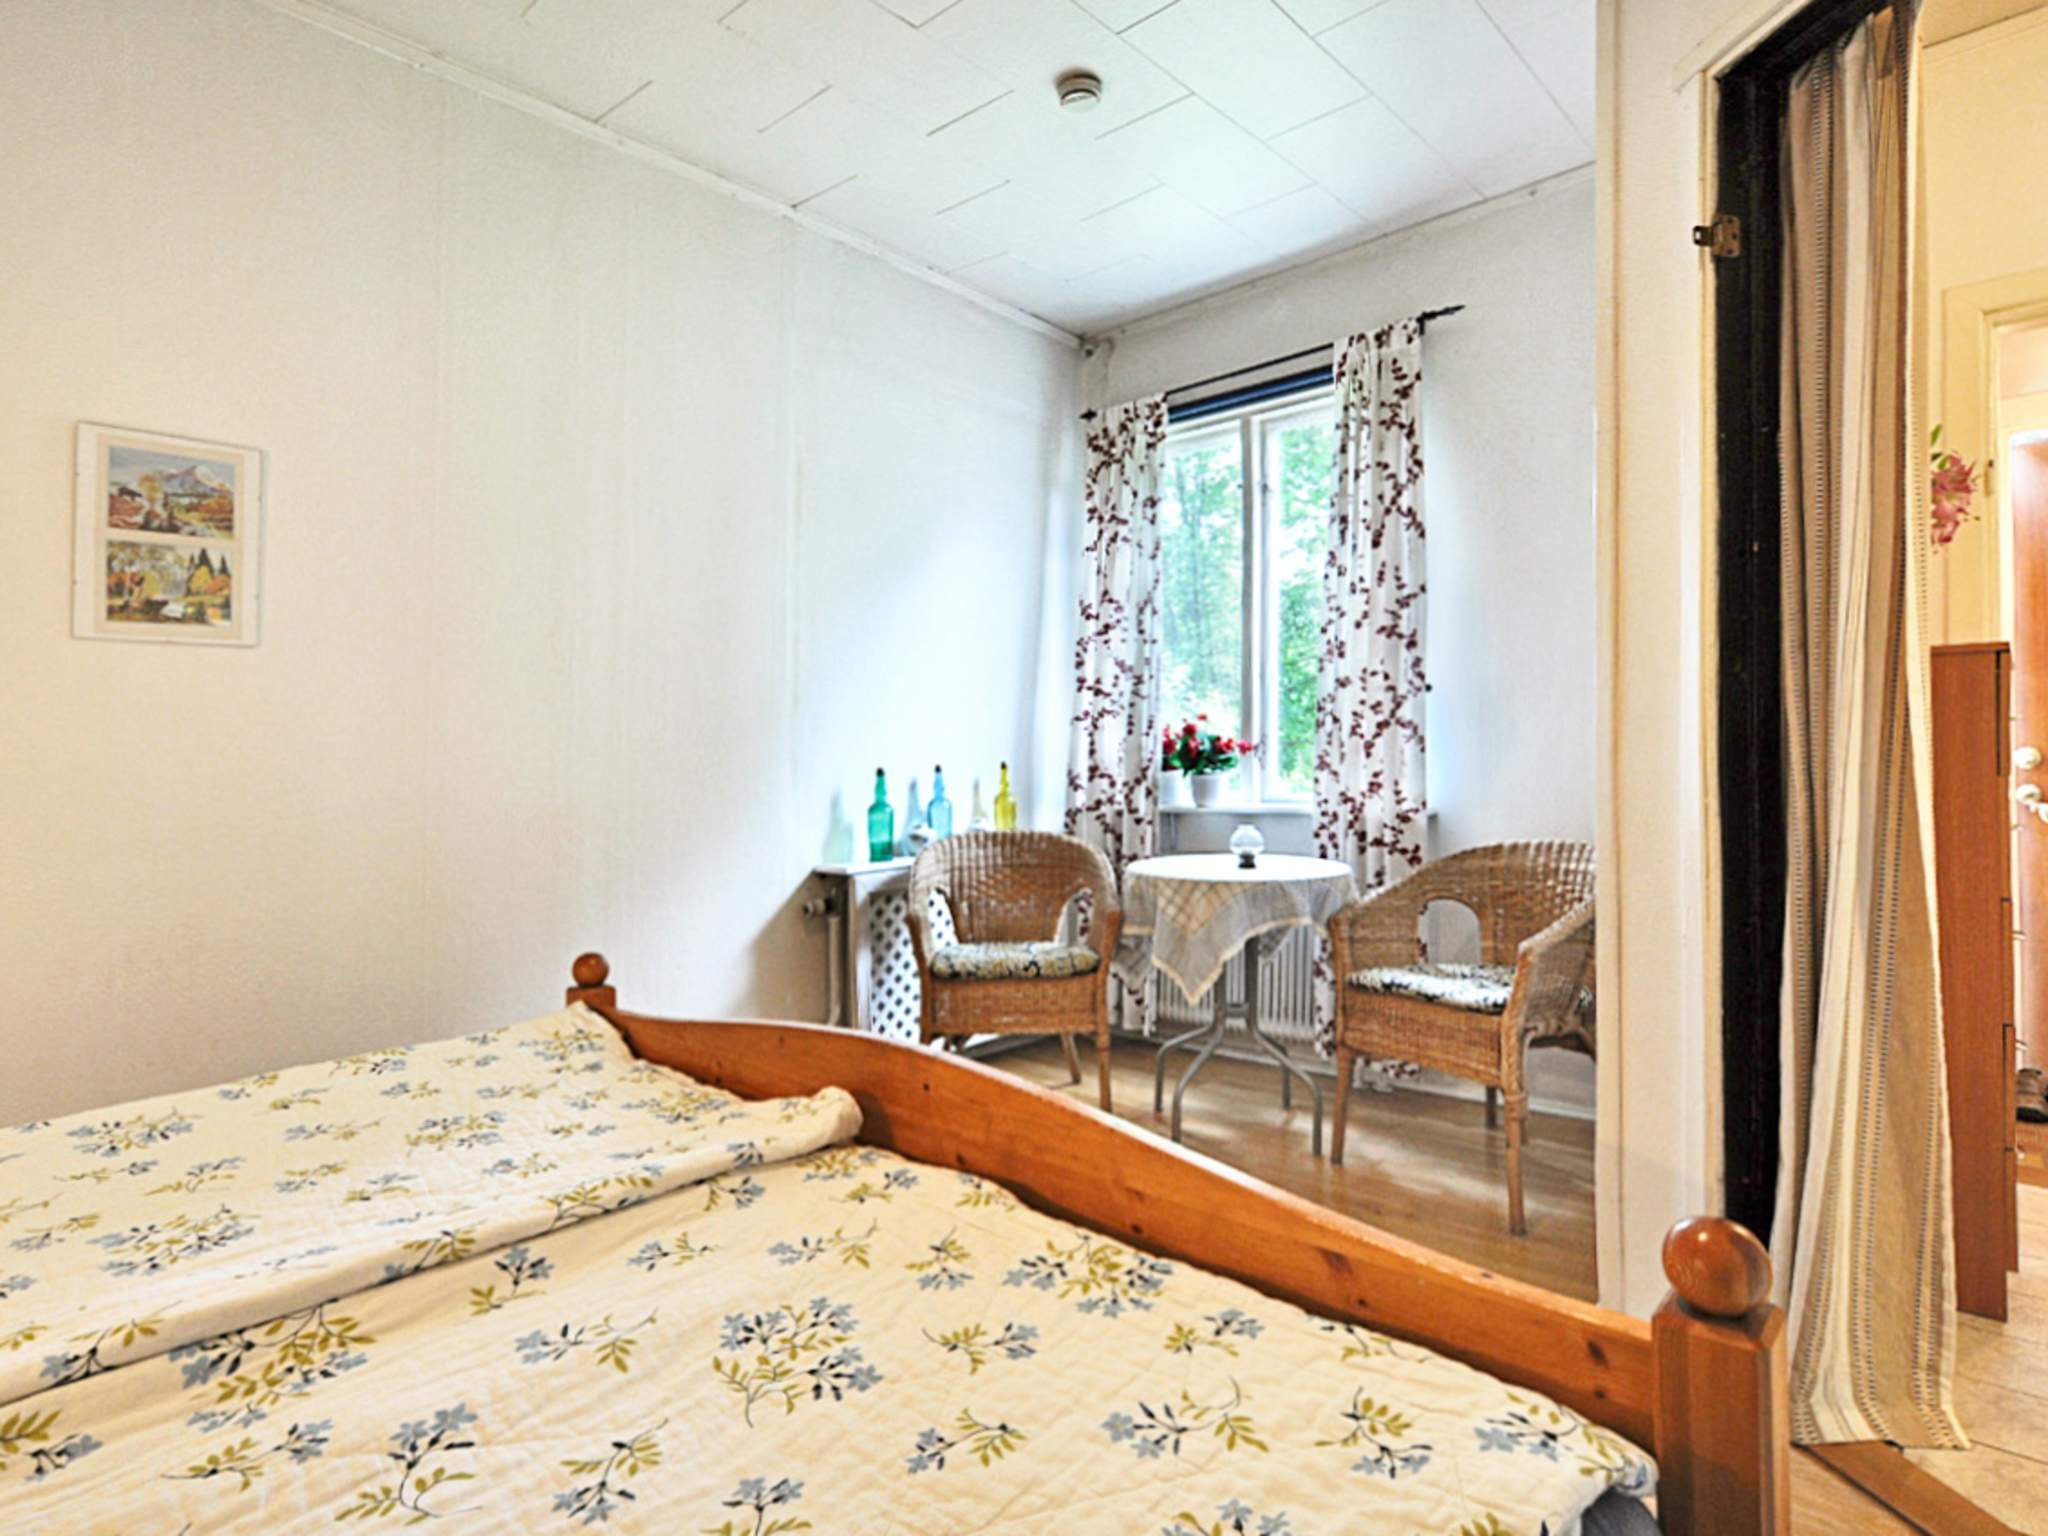 Ferienhaus Finjasjön (86936), Hässleholm, Skane län, Südschweden, Schweden, Bild 8